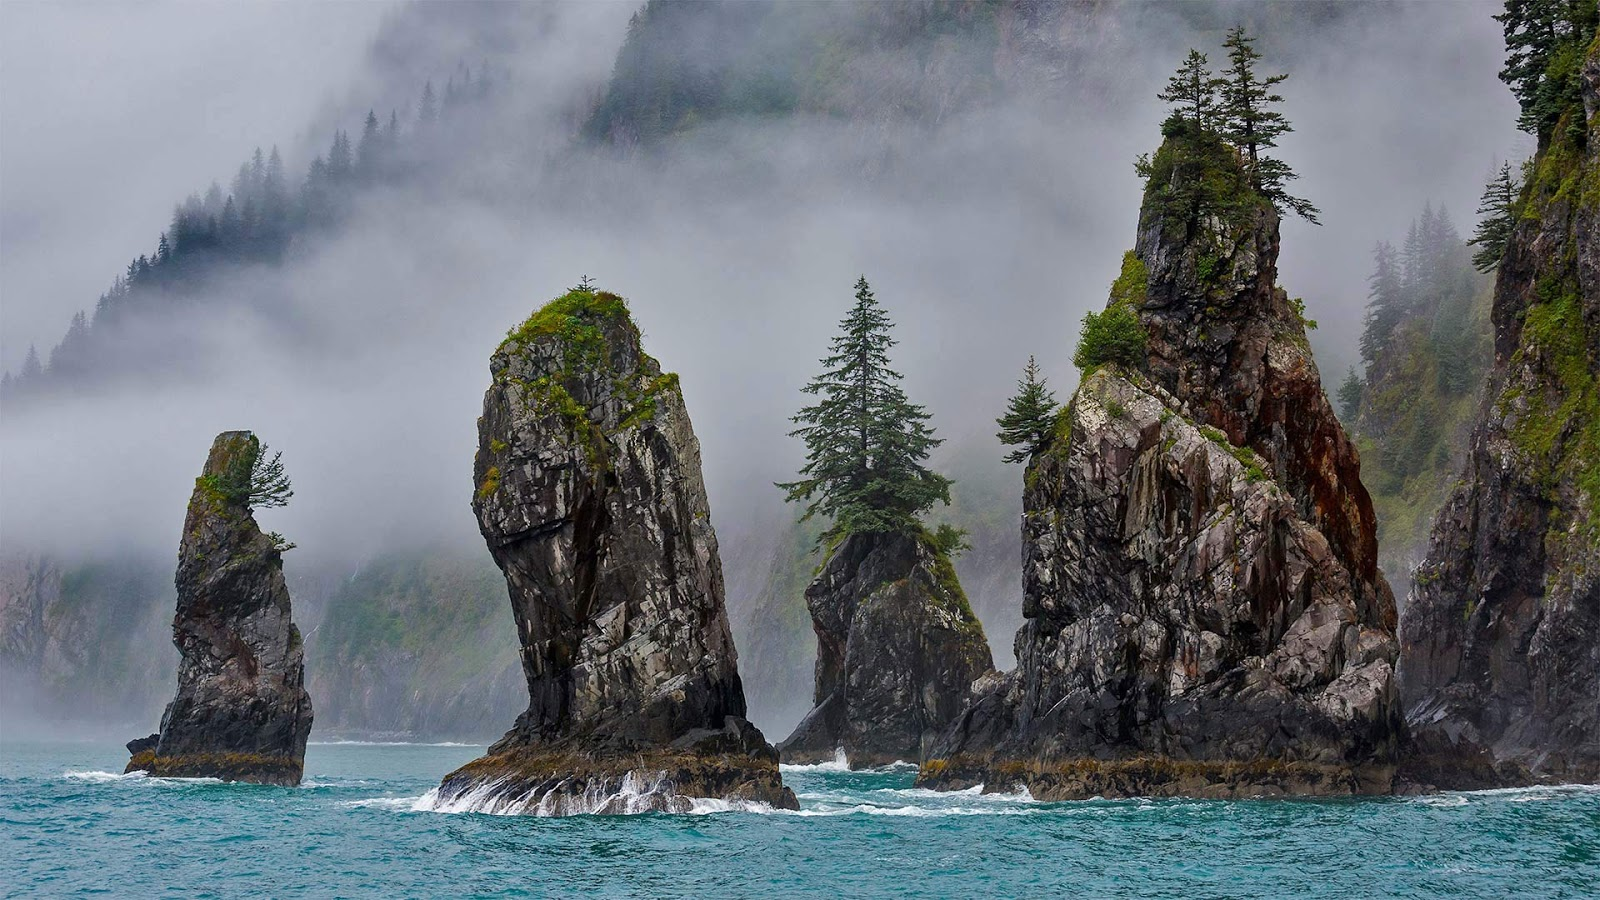 The Cove of Spires in Kenai Fjords National Park near Seward, Alaska © Grant Ordelheide/Tandem Stills + Motion